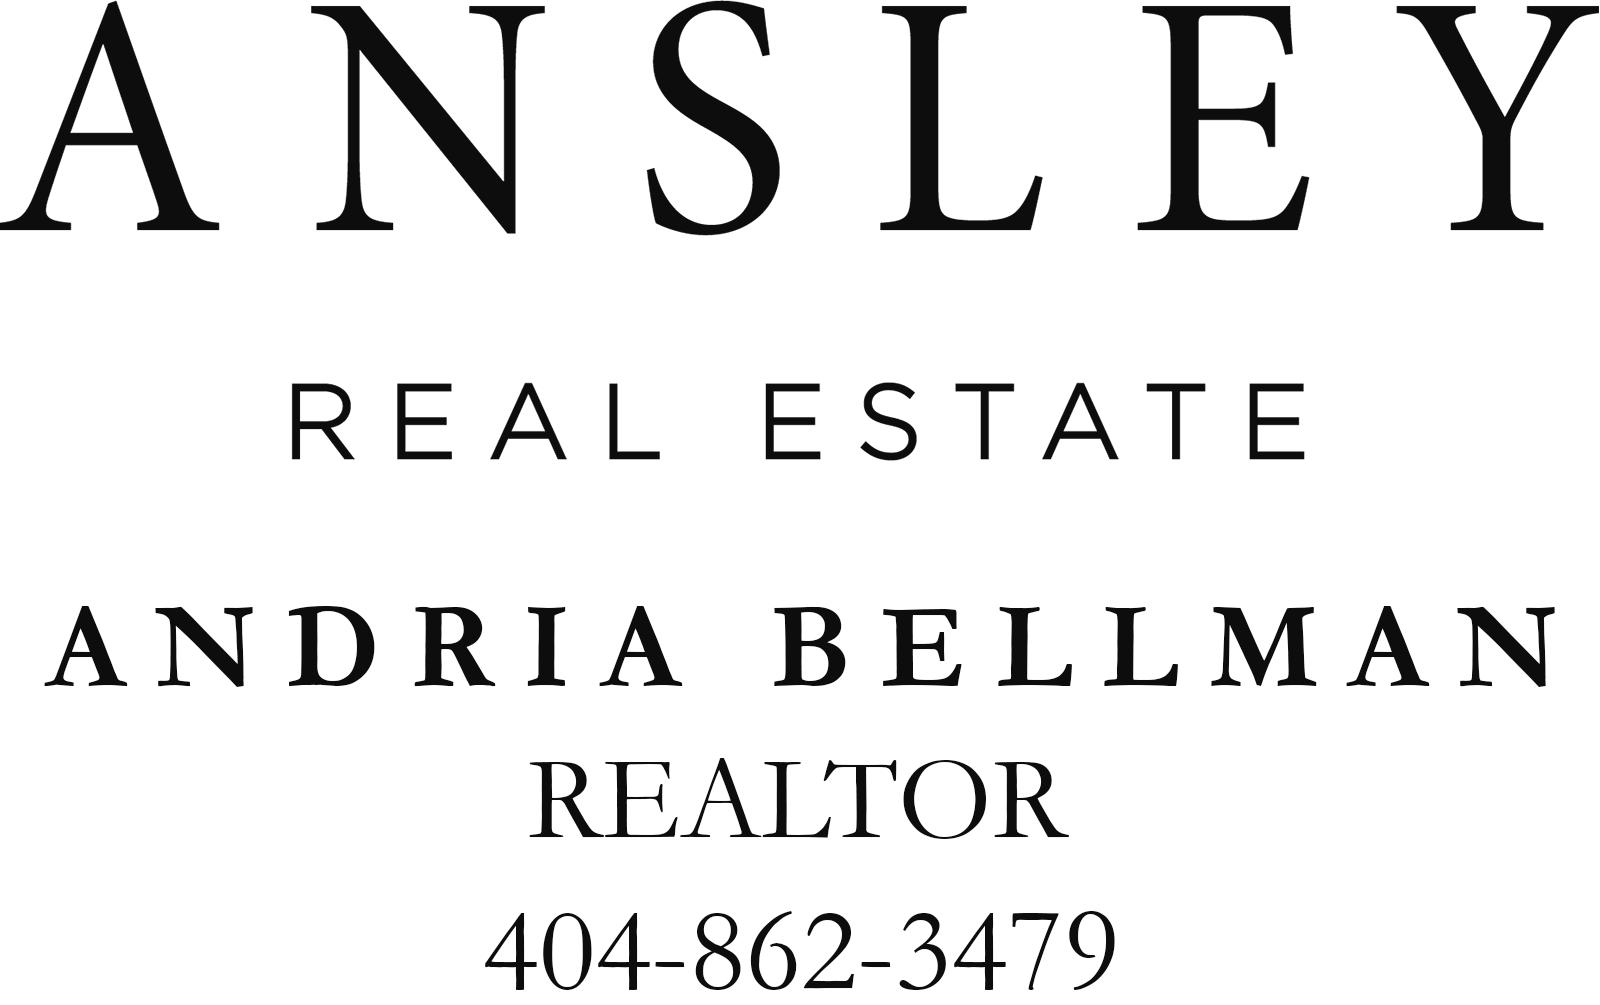 Andria Bellman - Ansley Real Estate